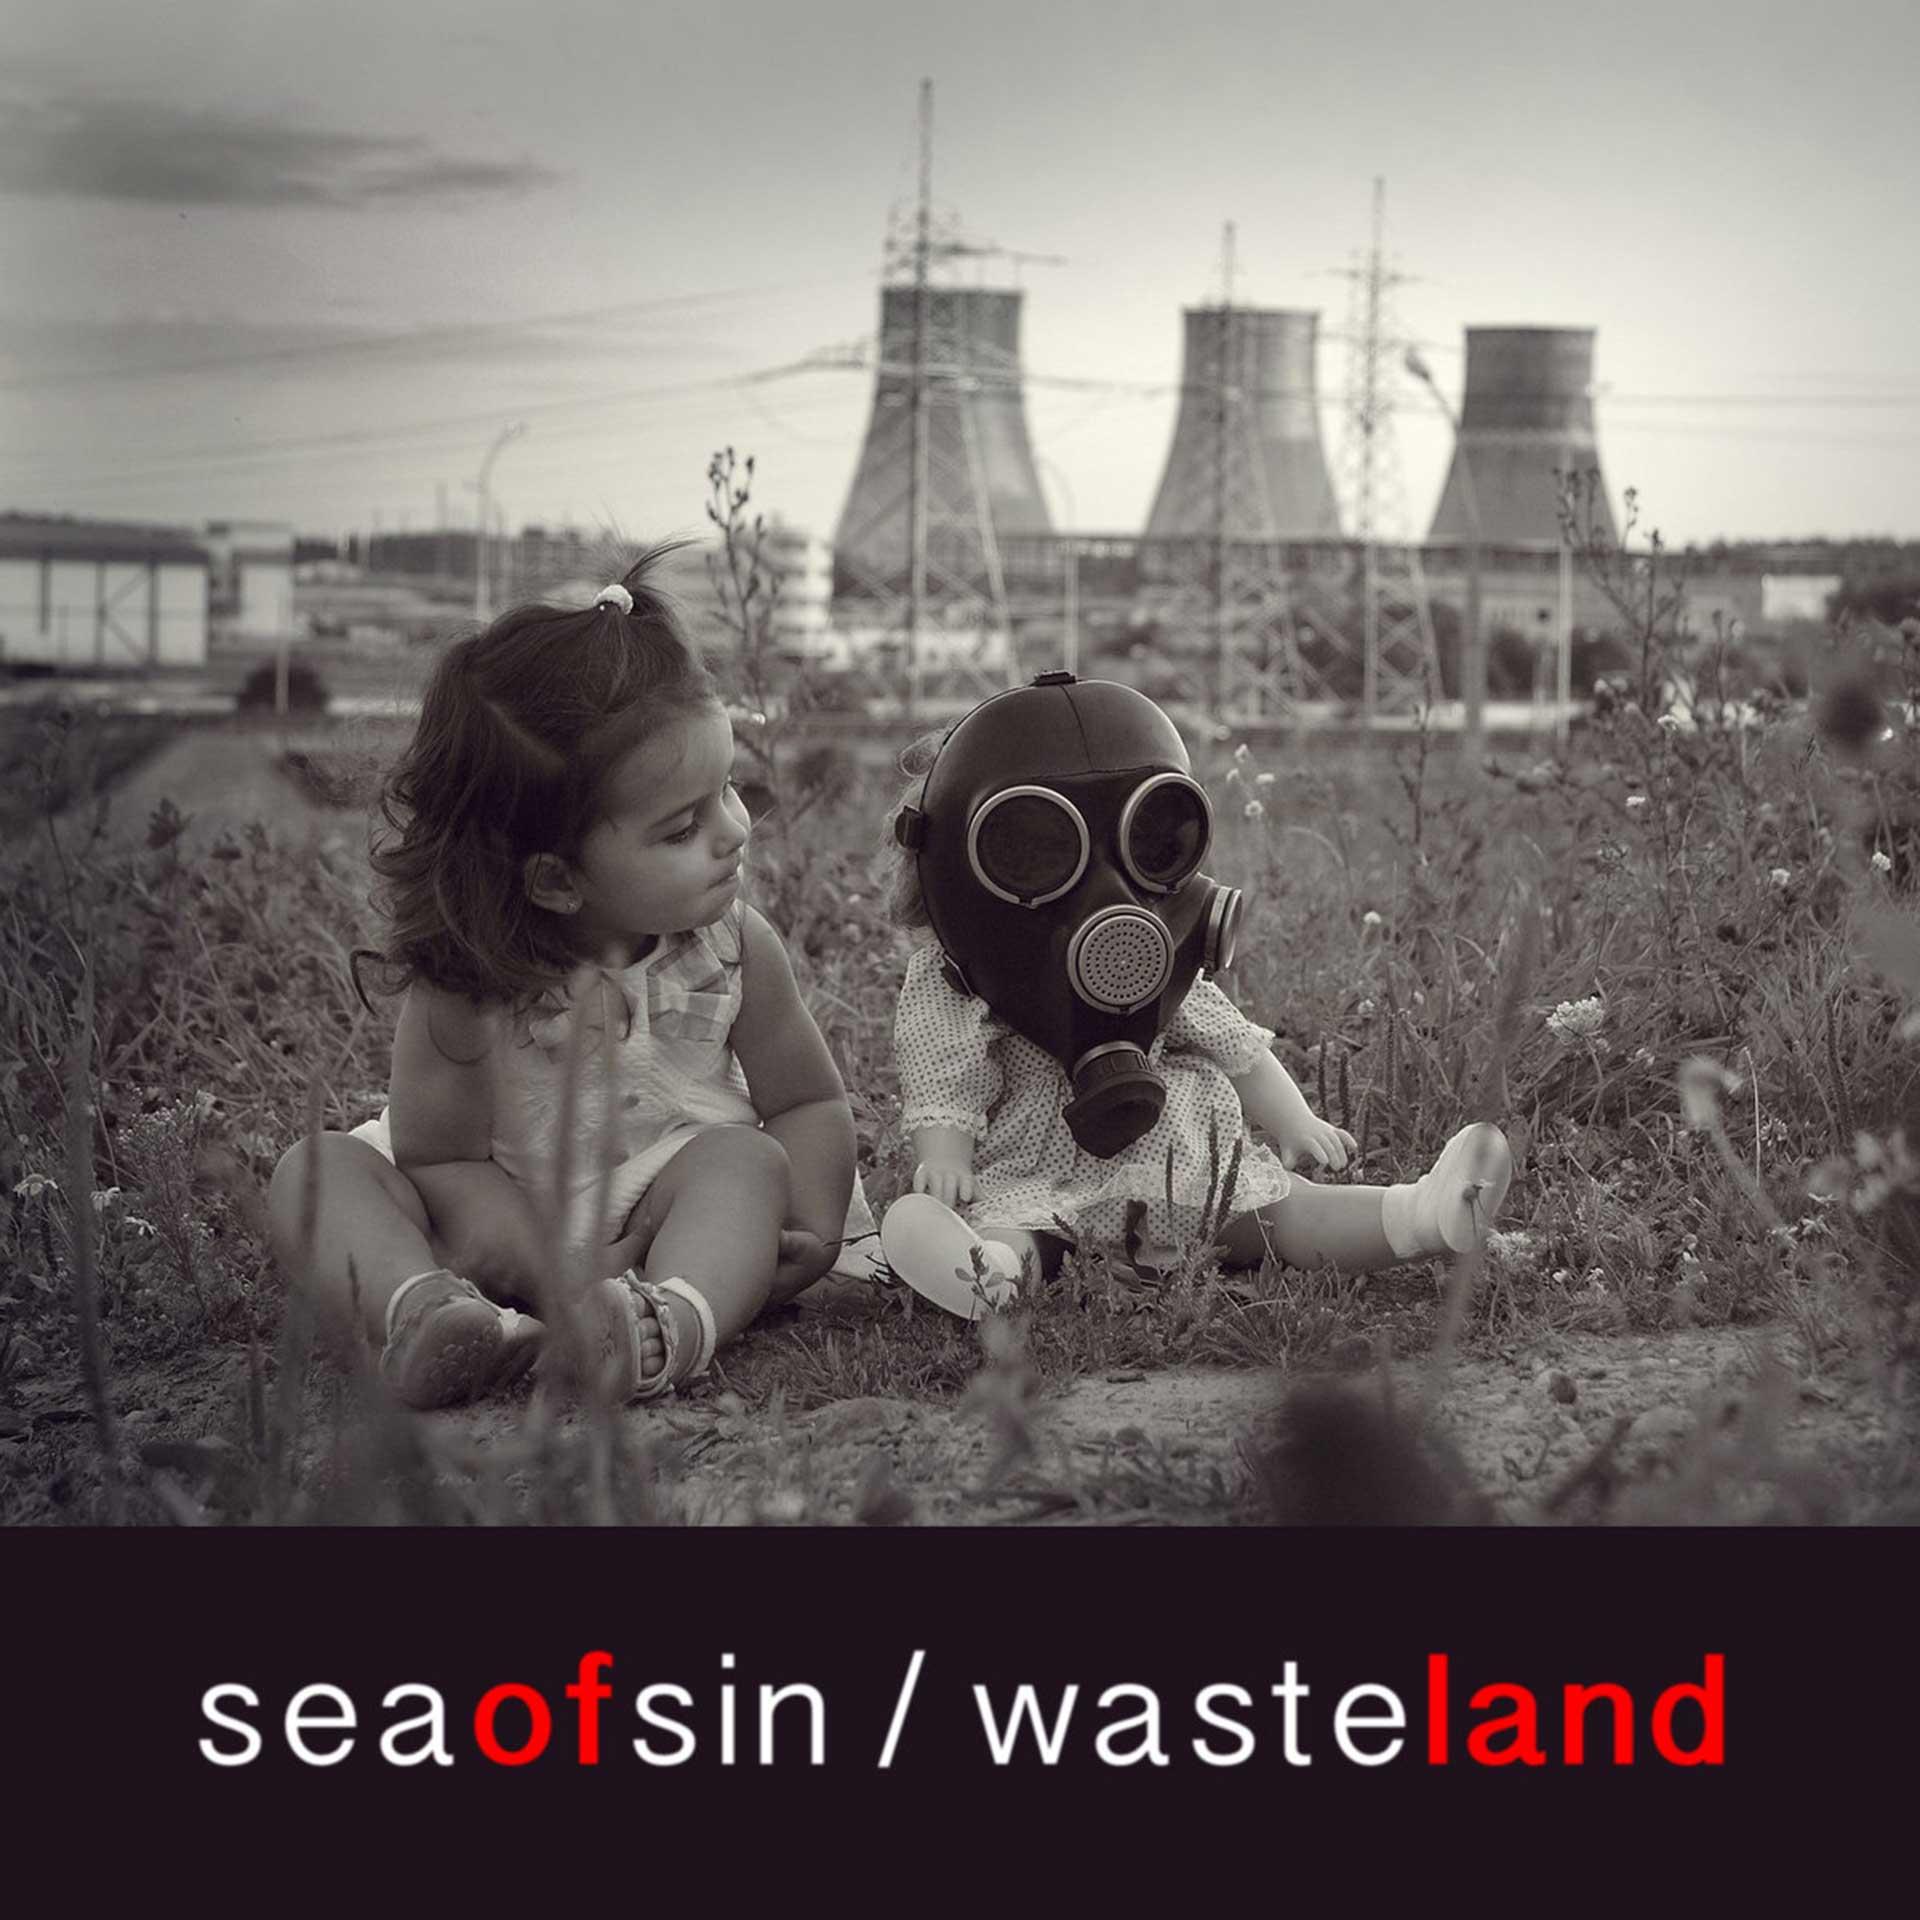 seaofsin - Wasteland